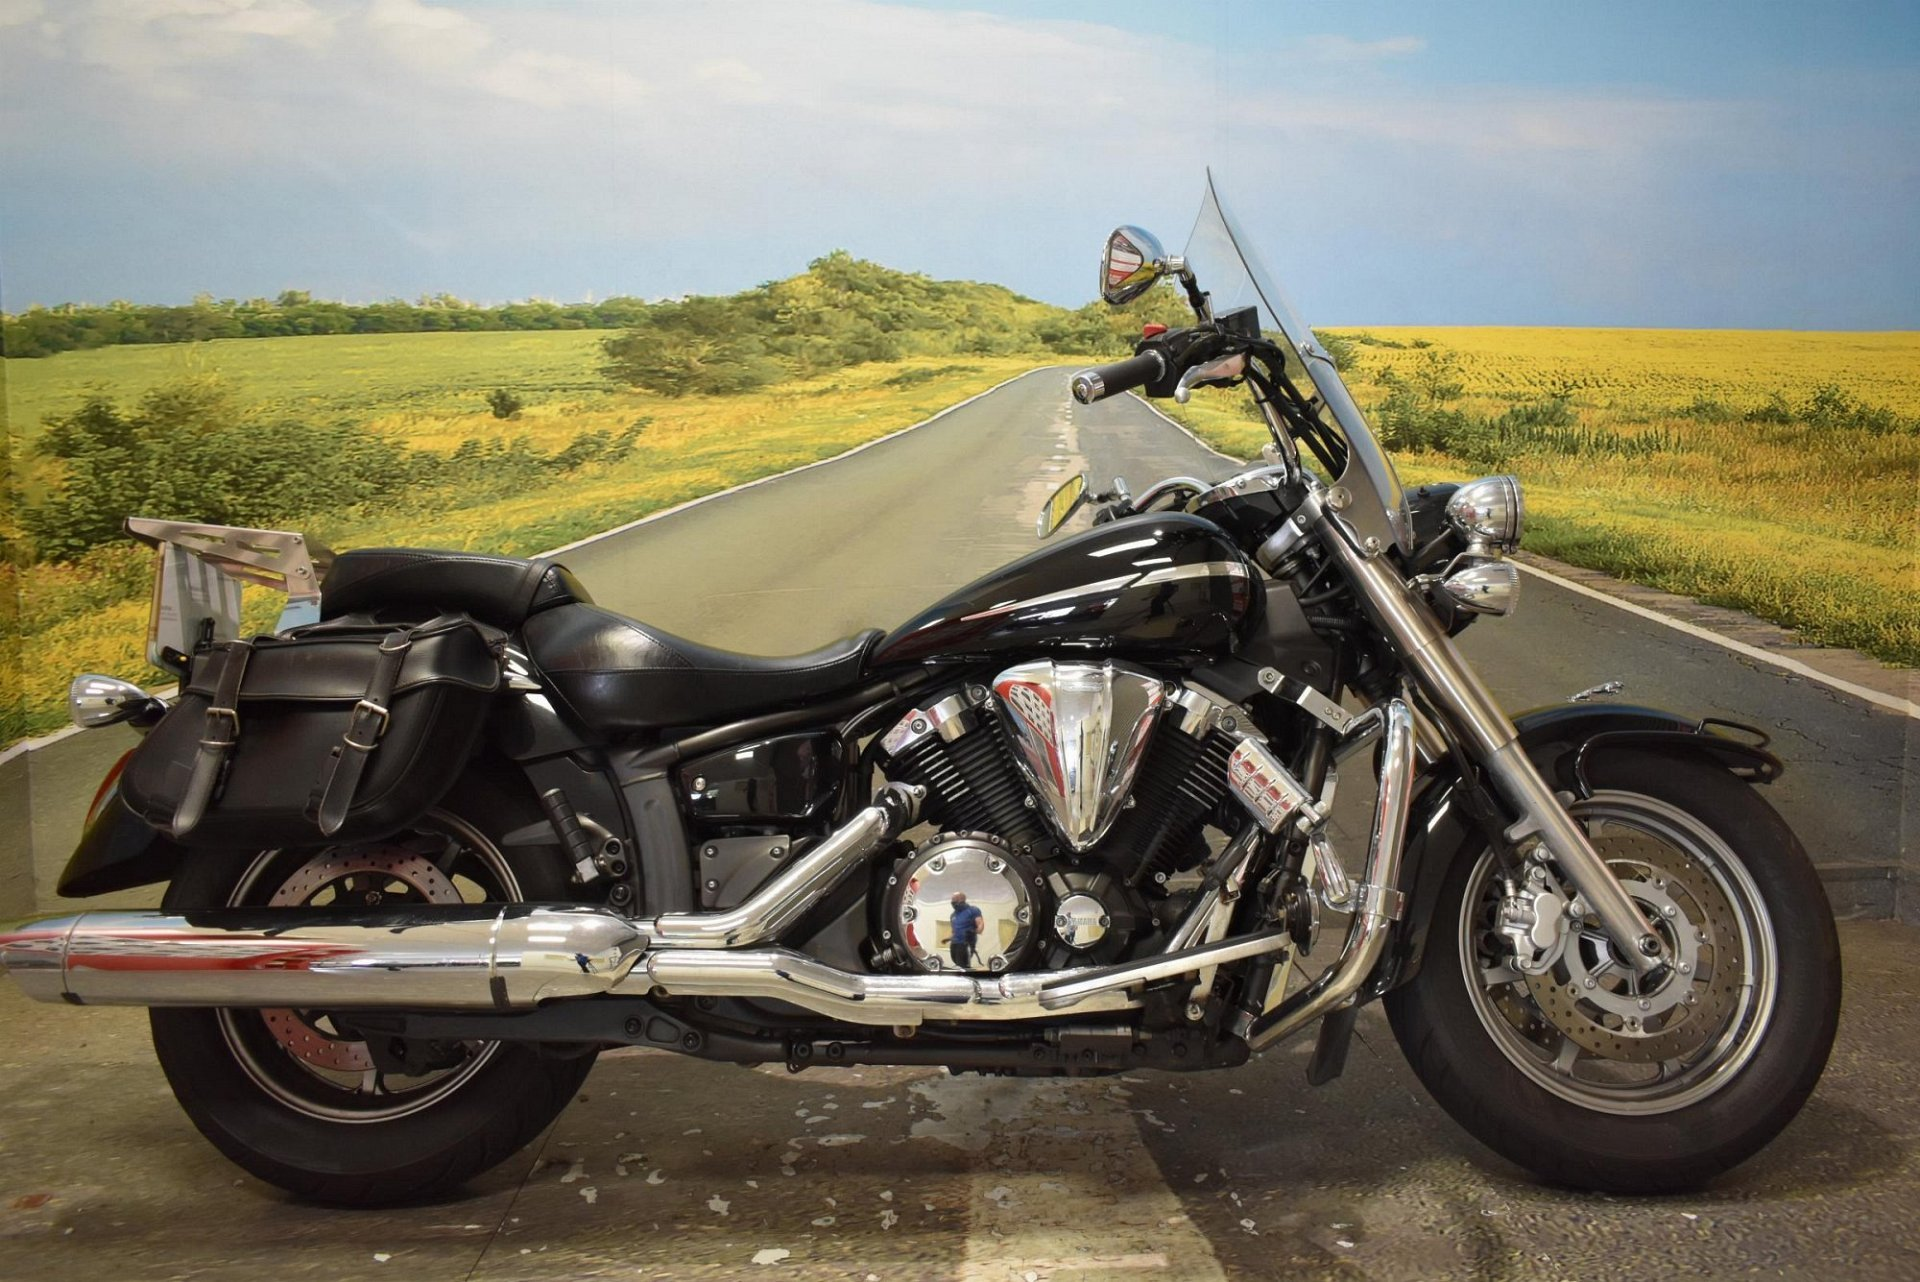 2007 Yamaha XVS1300A Midnight Star for sale in Derbyshire